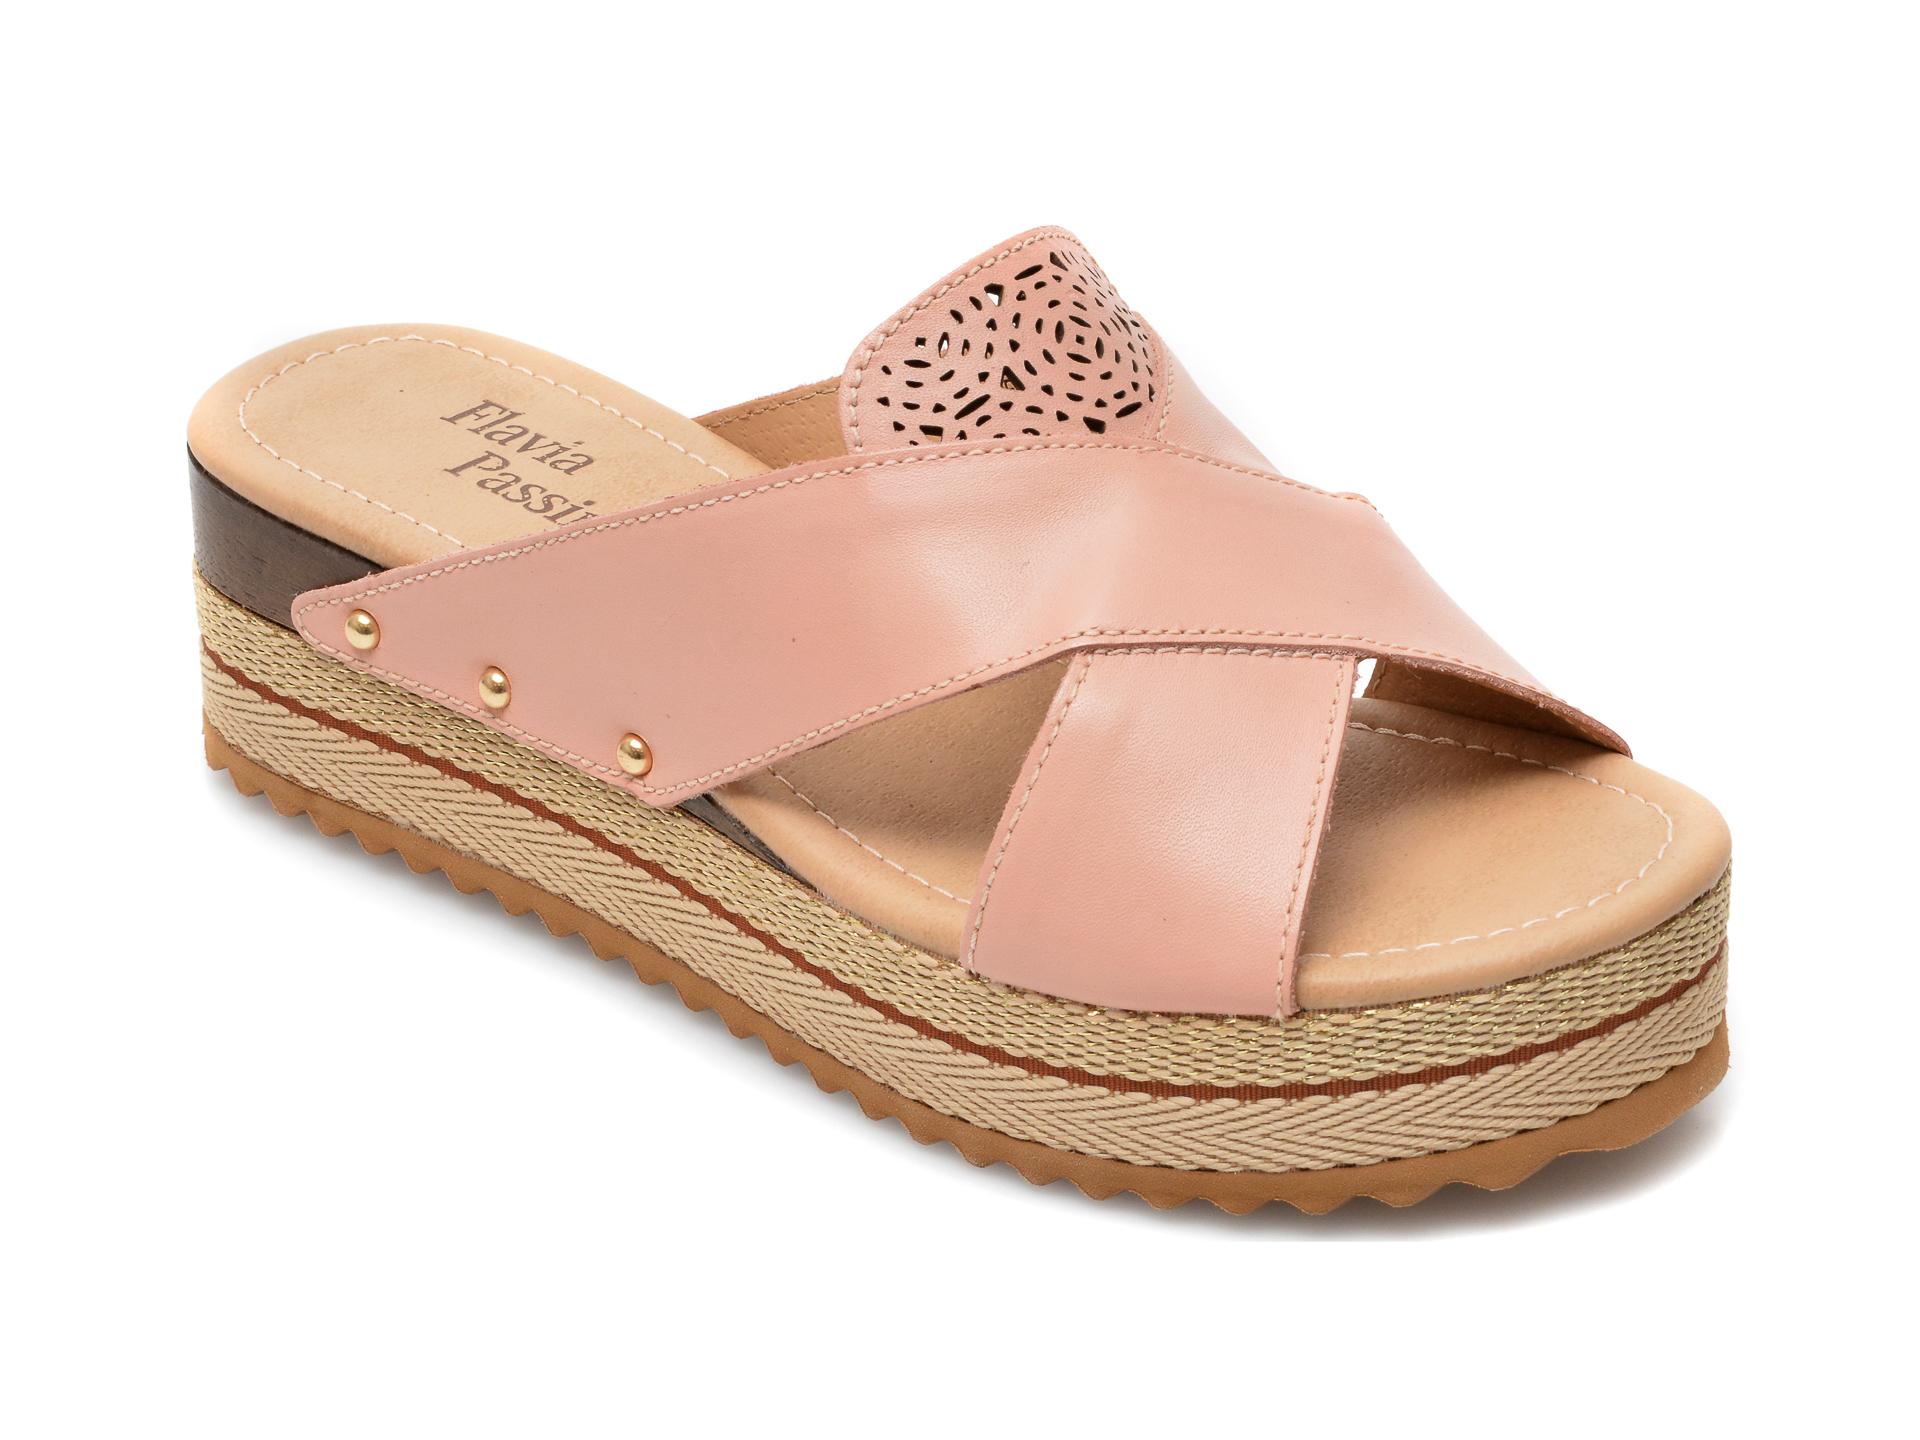 Papuci FLAVIA PASSINI roz, 320803, din piele naturala imagine otter.ro 2021